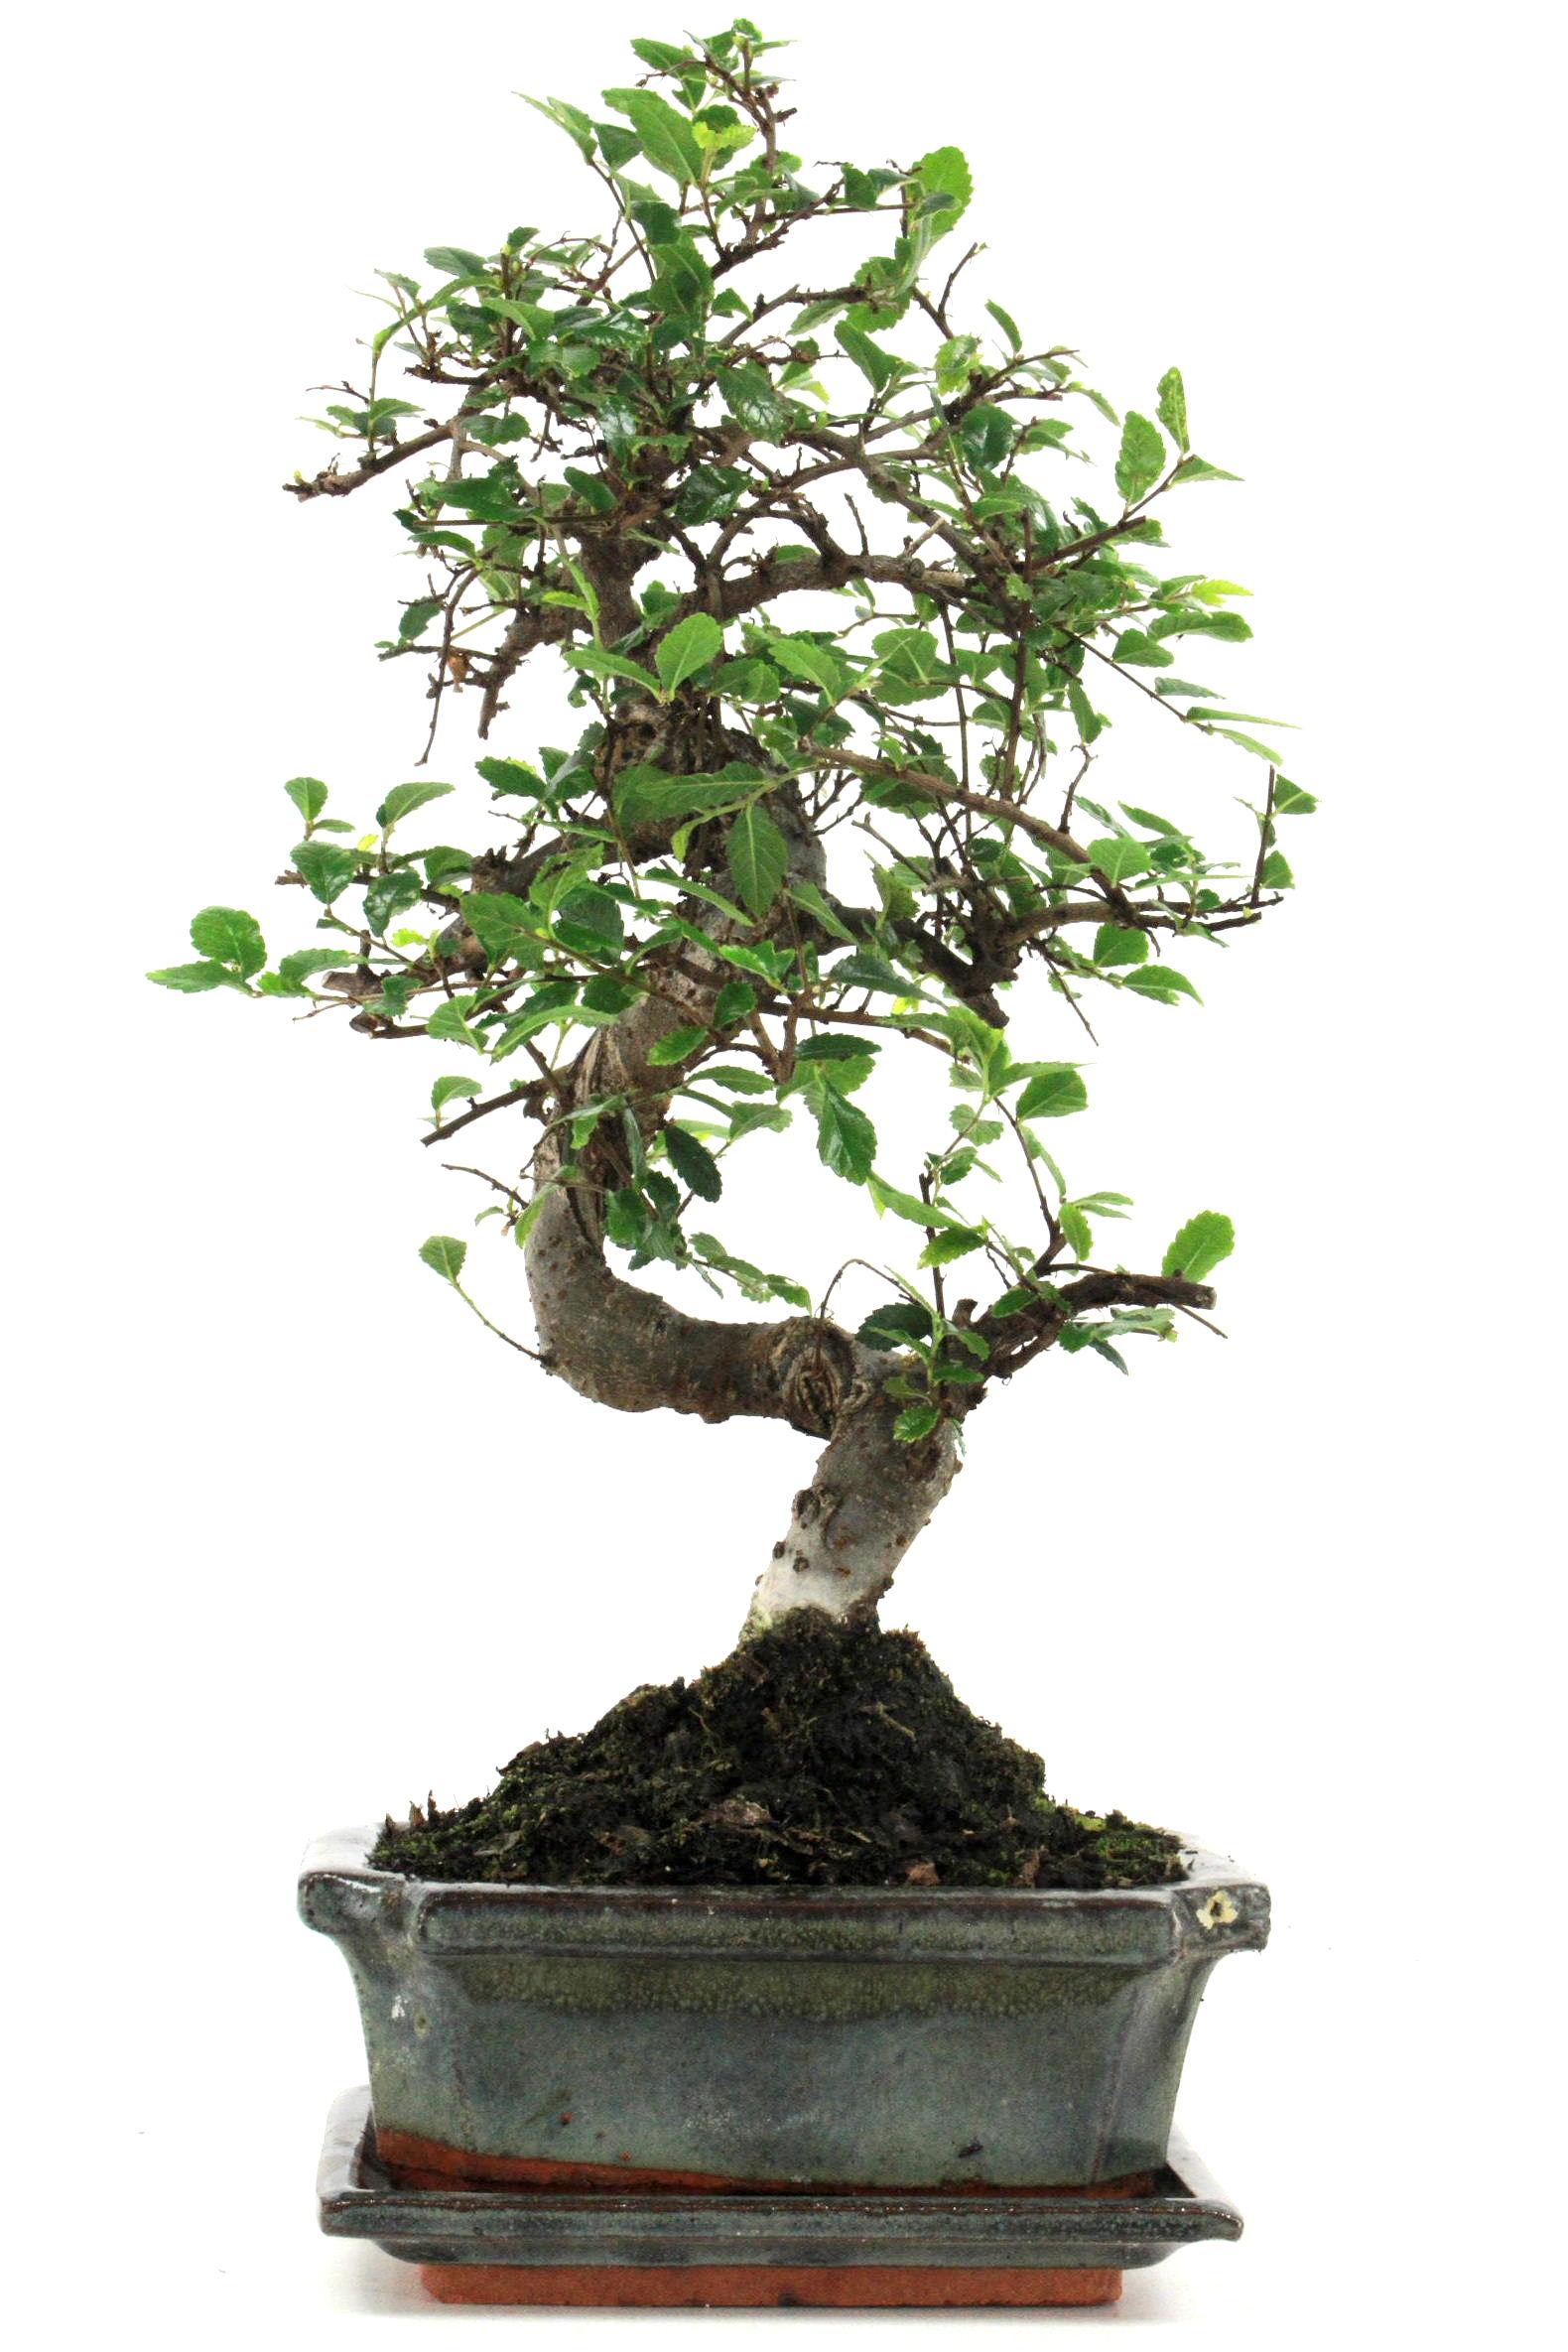 bonsai chinesische ulme 30 35 cm g164 bei oyaki bonsai kaufen. Black Bedroom Furniture Sets. Home Design Ideas